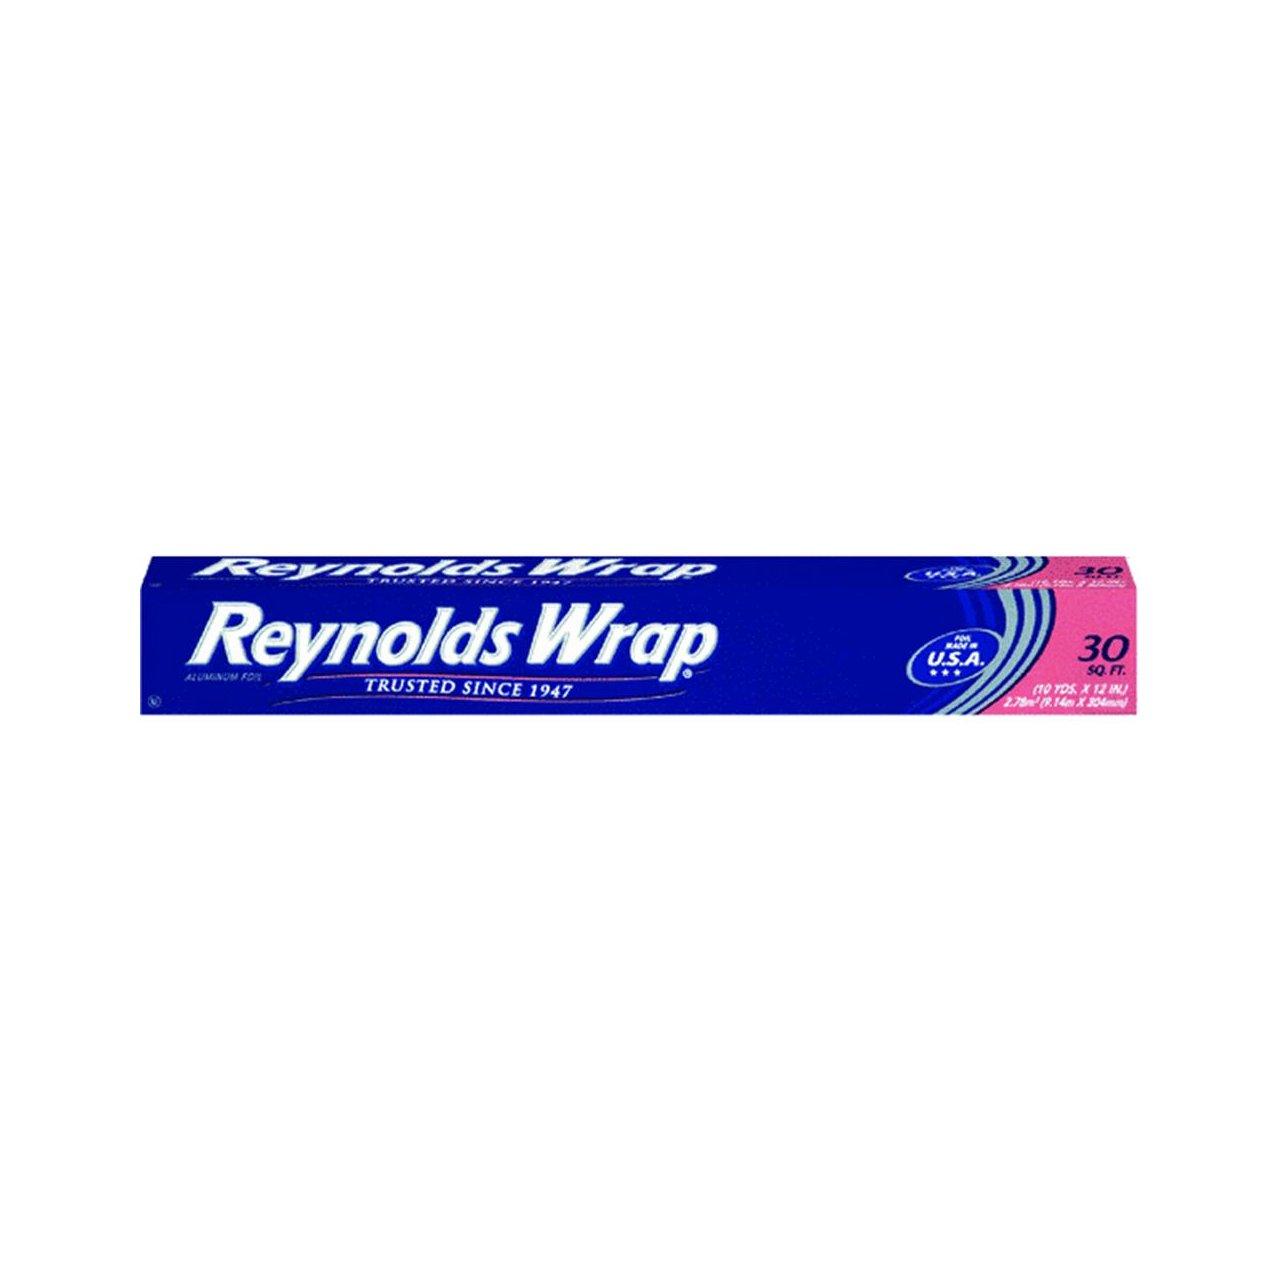 Reynolds Wrap Aluminum Foil (Pack of 2)